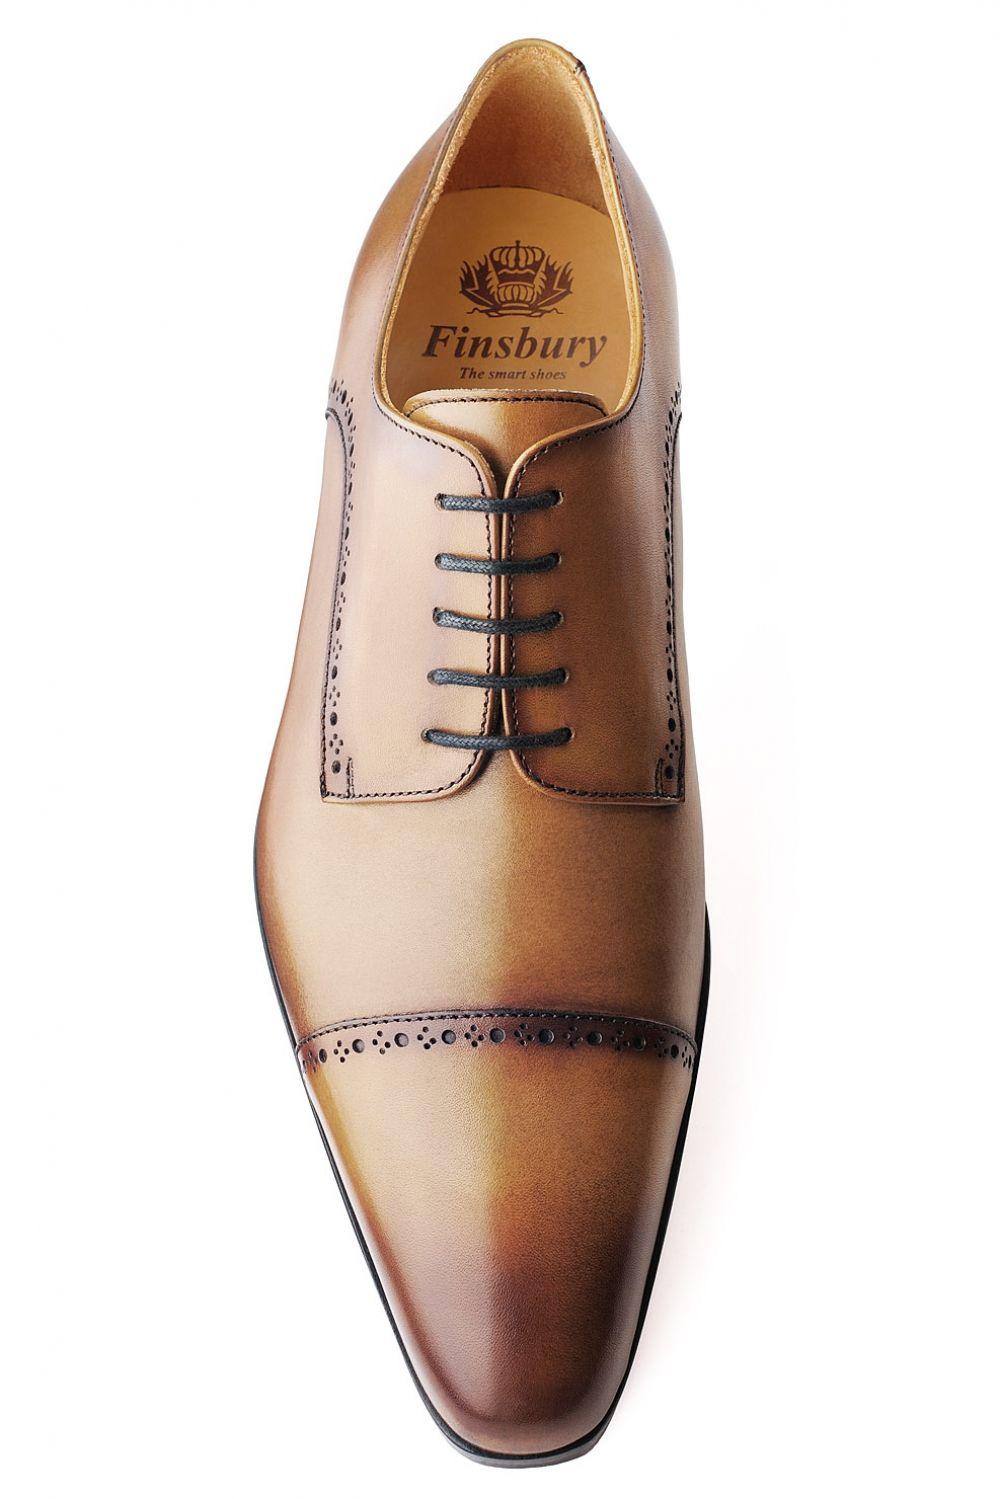 MONTANA Gold patiné Finsbury Shoes | Chaussures pour